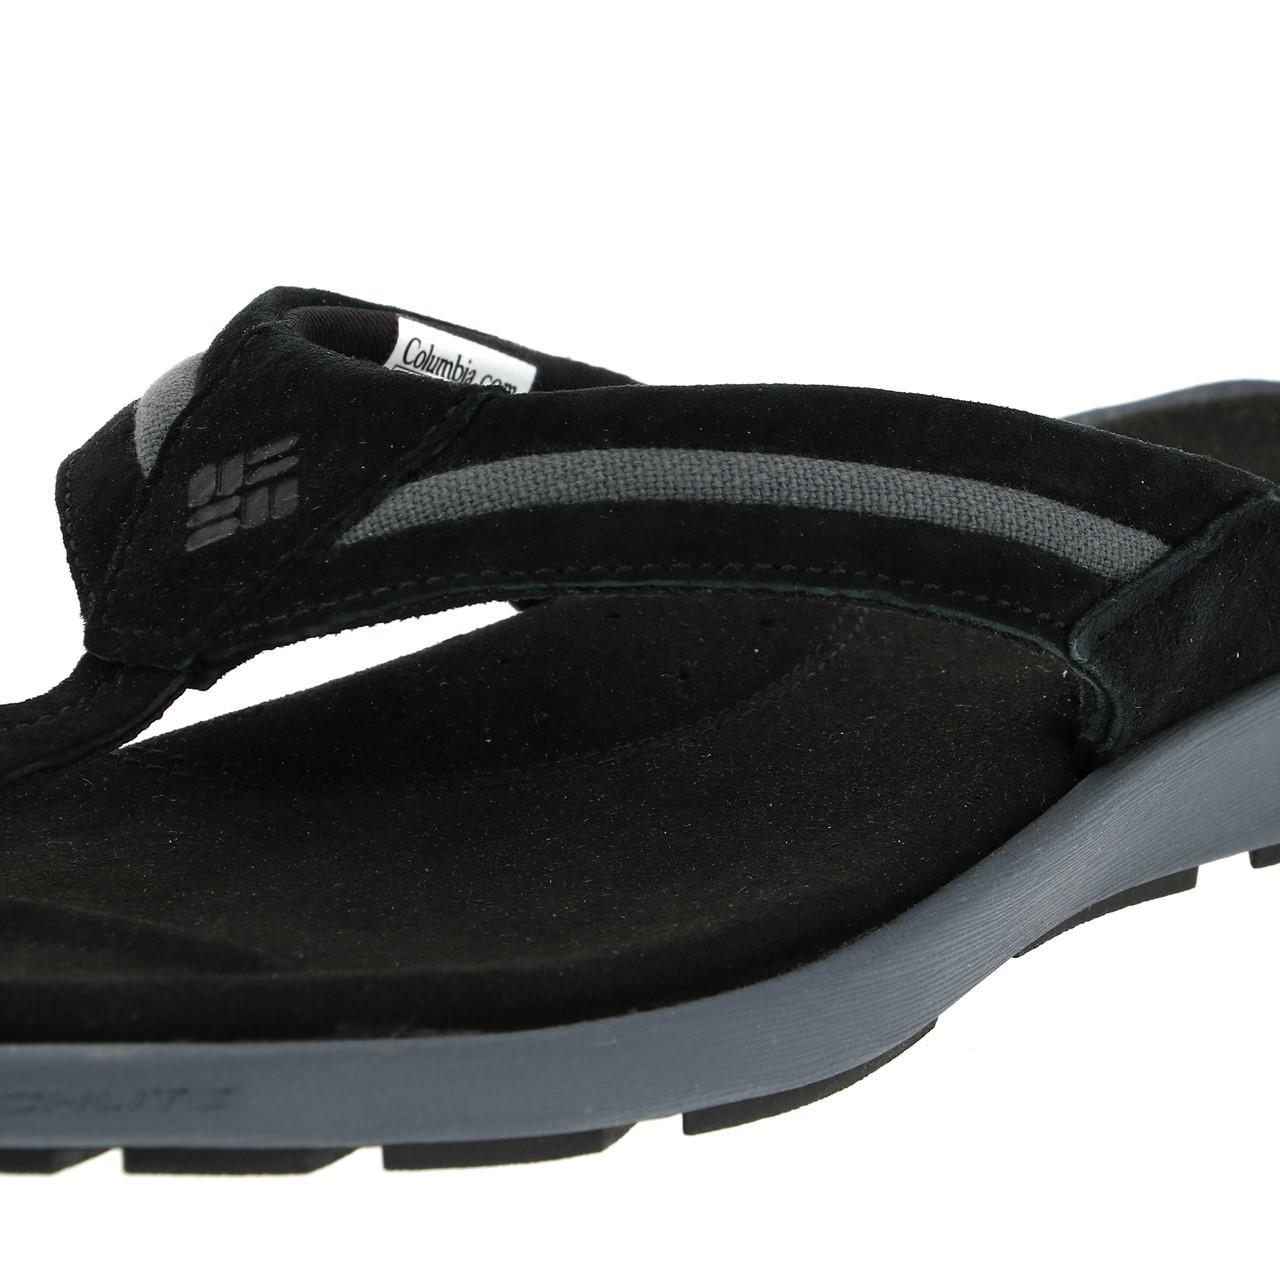 Flip-Flops-Tap-Dance-Shoes-Columbia-Verona-Black-Flip-Flop-Black-18113-New